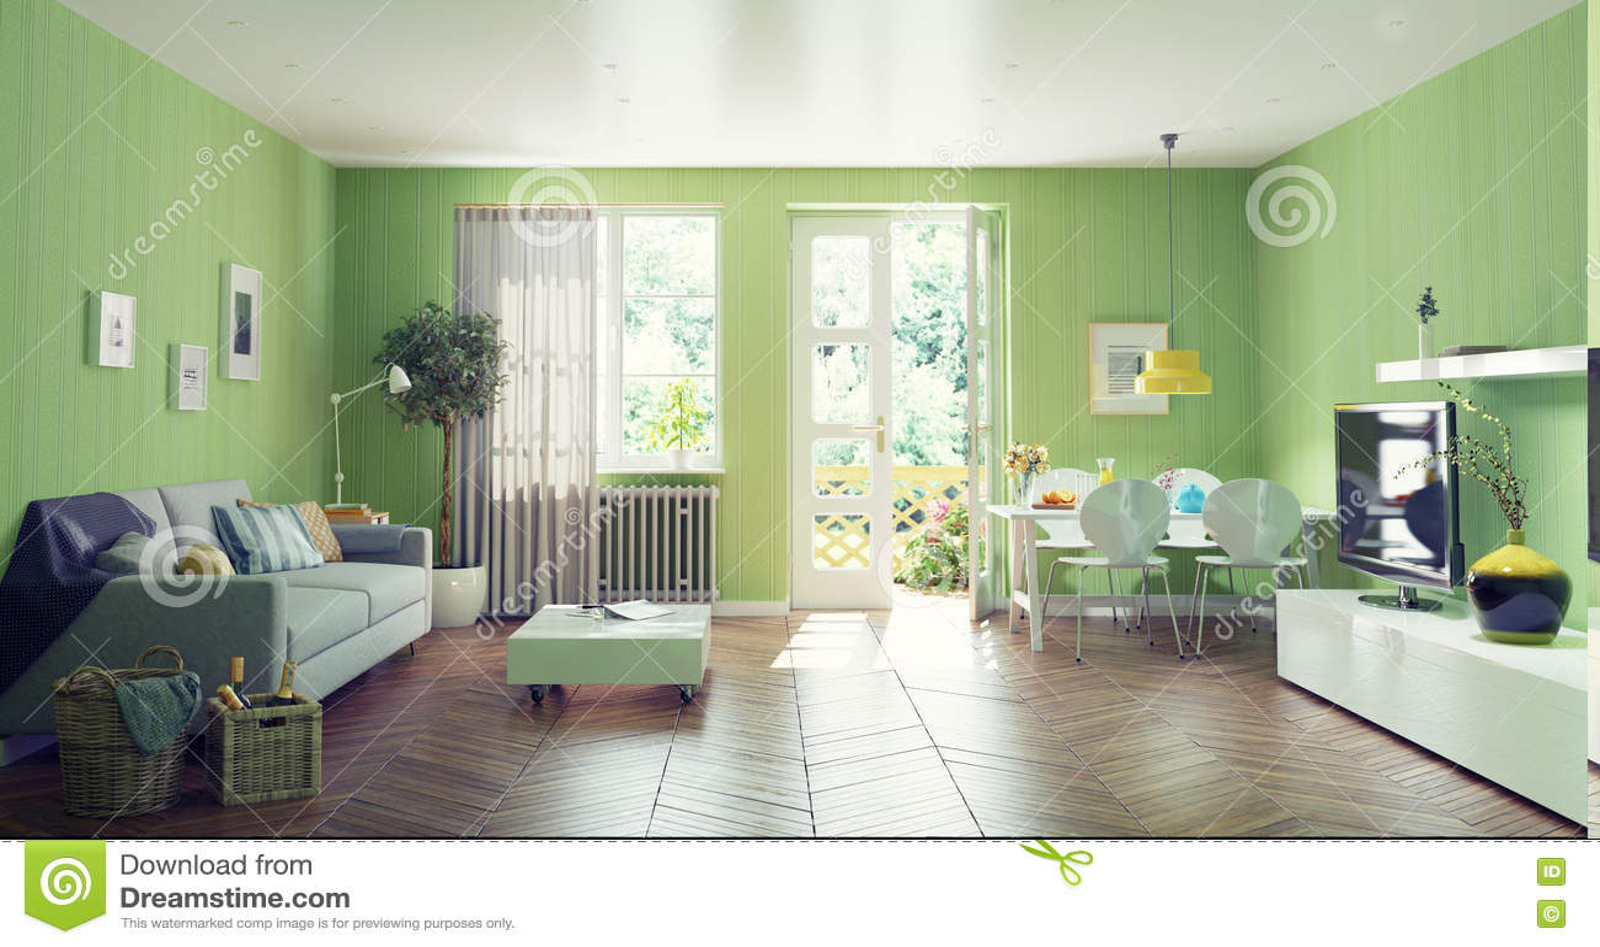 Modern living room stock illustration image 60324381 for Modern living room concepts